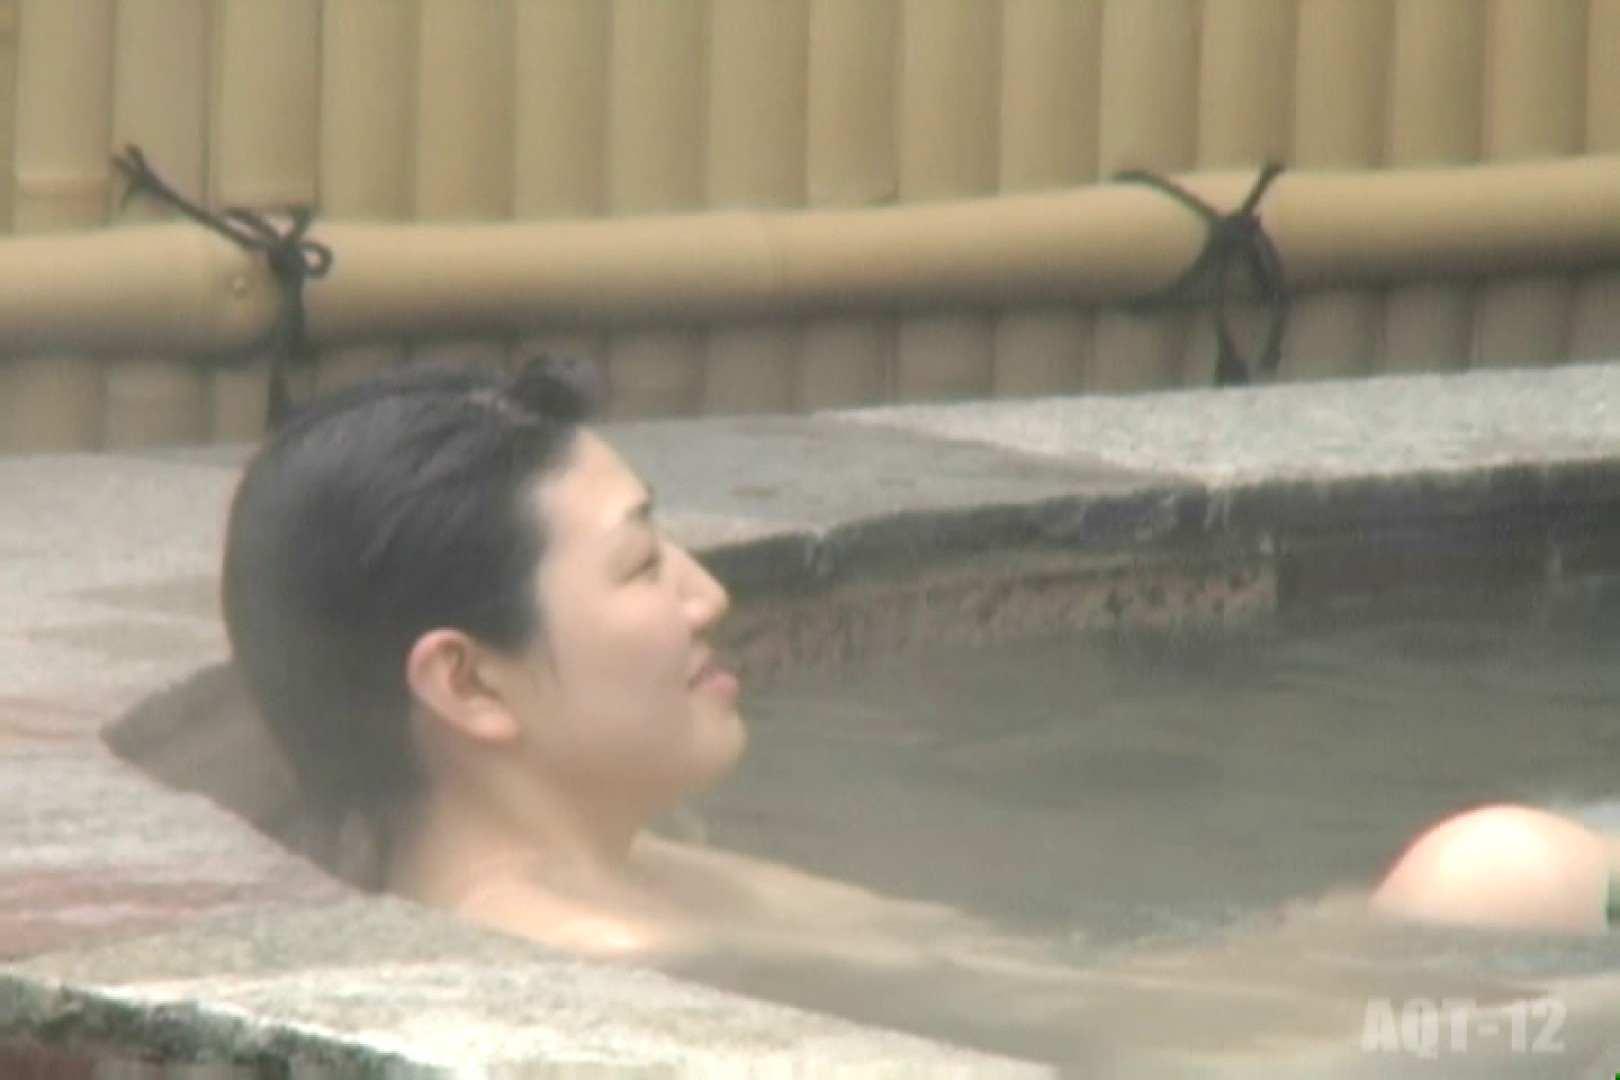 Aquaな露天風呂Vol.810 露天   OLセックス  58画像 34